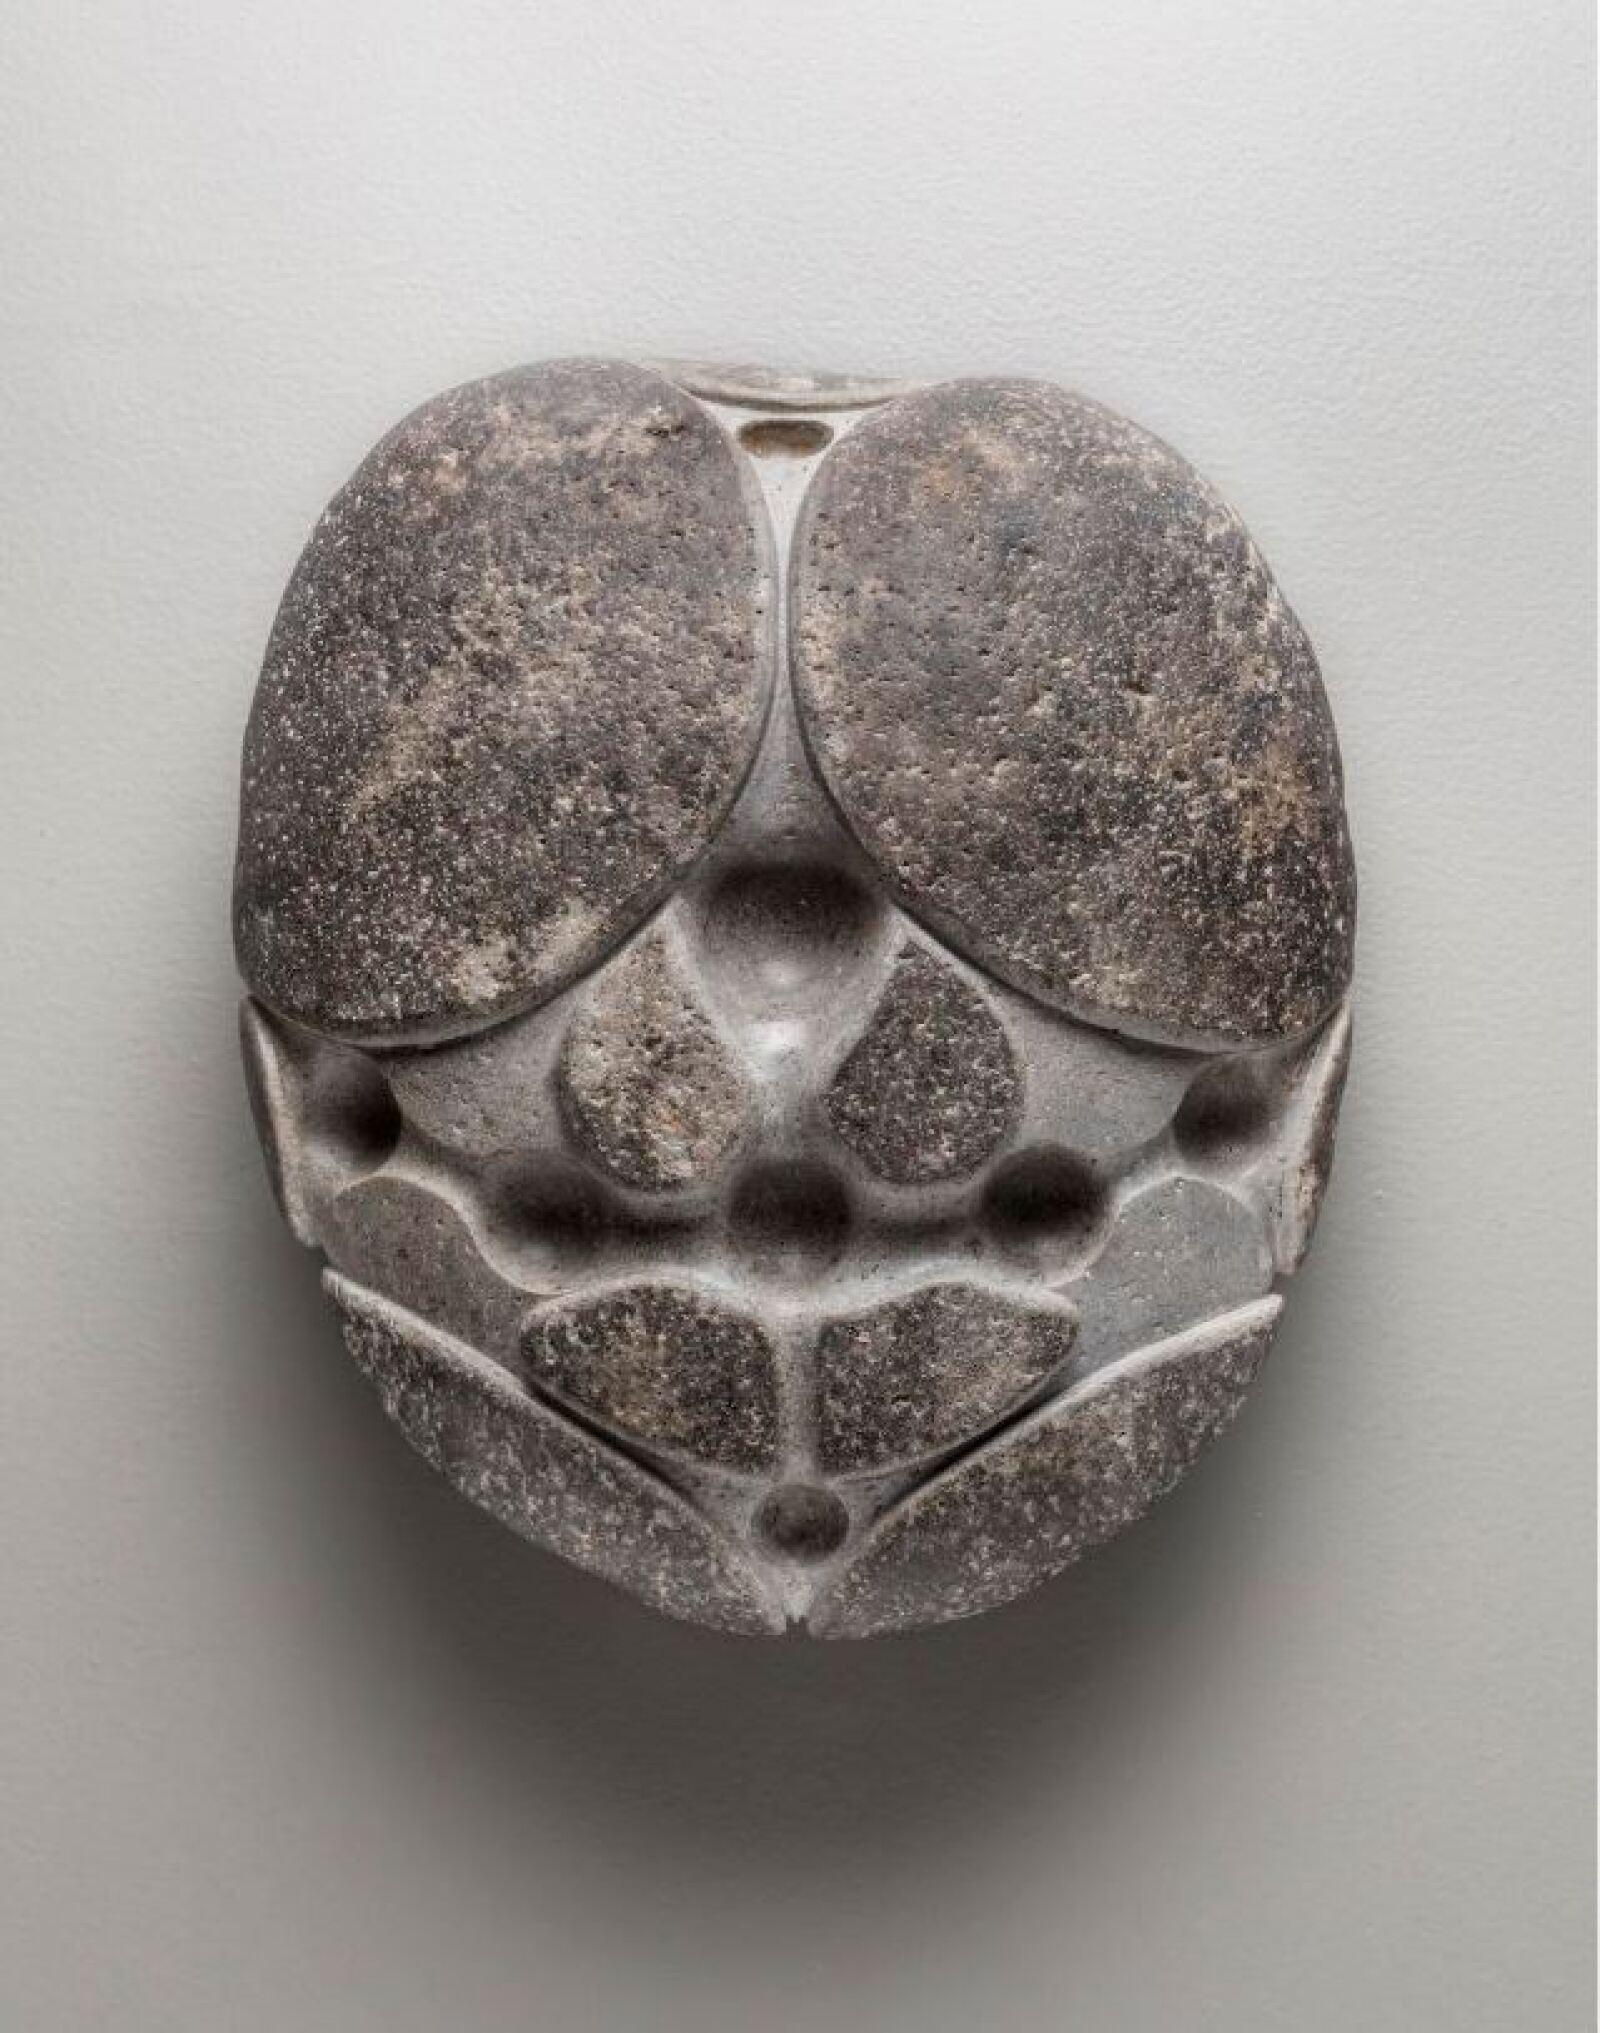 Roca tortuga